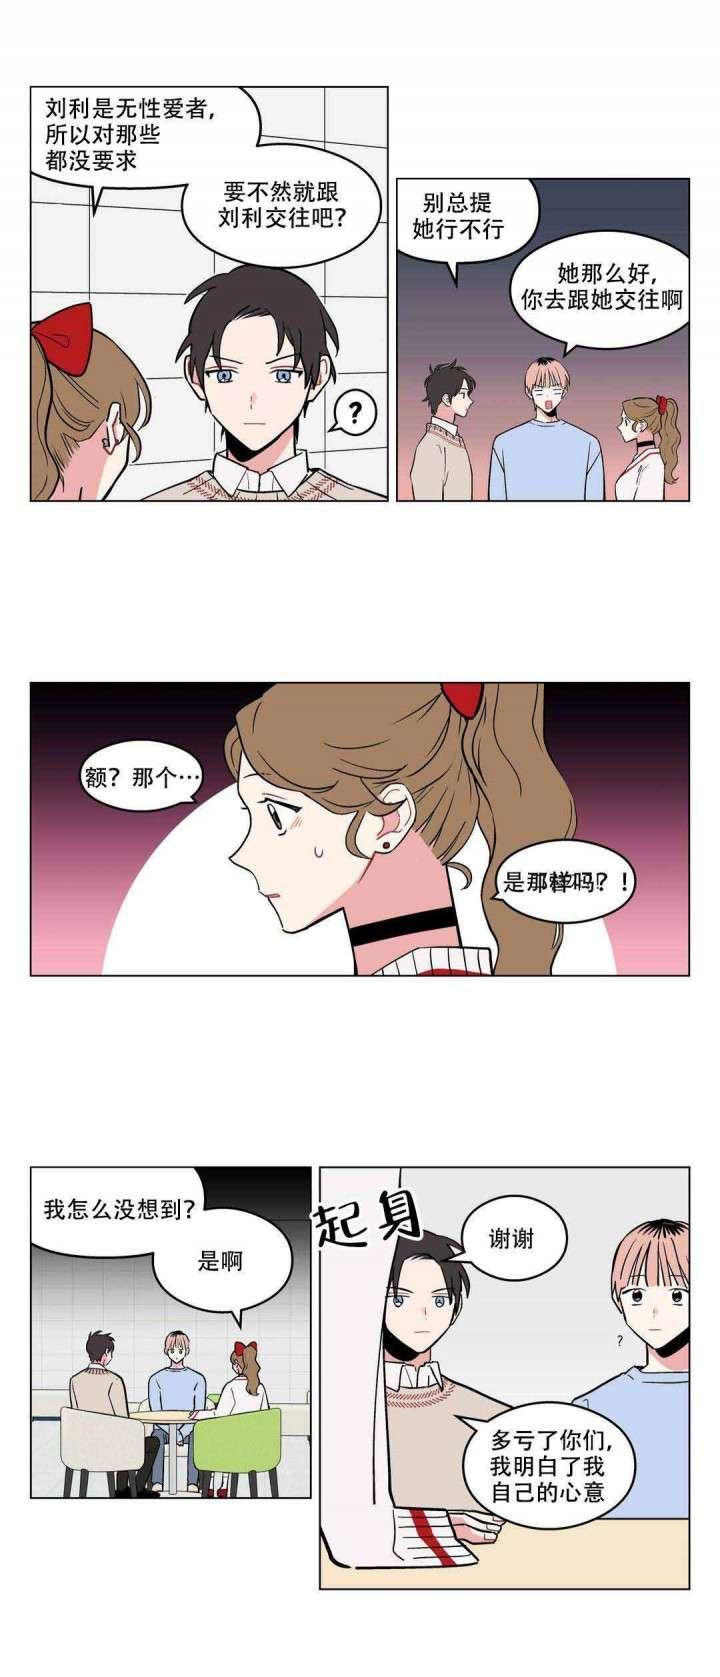 第15章-浪漫A